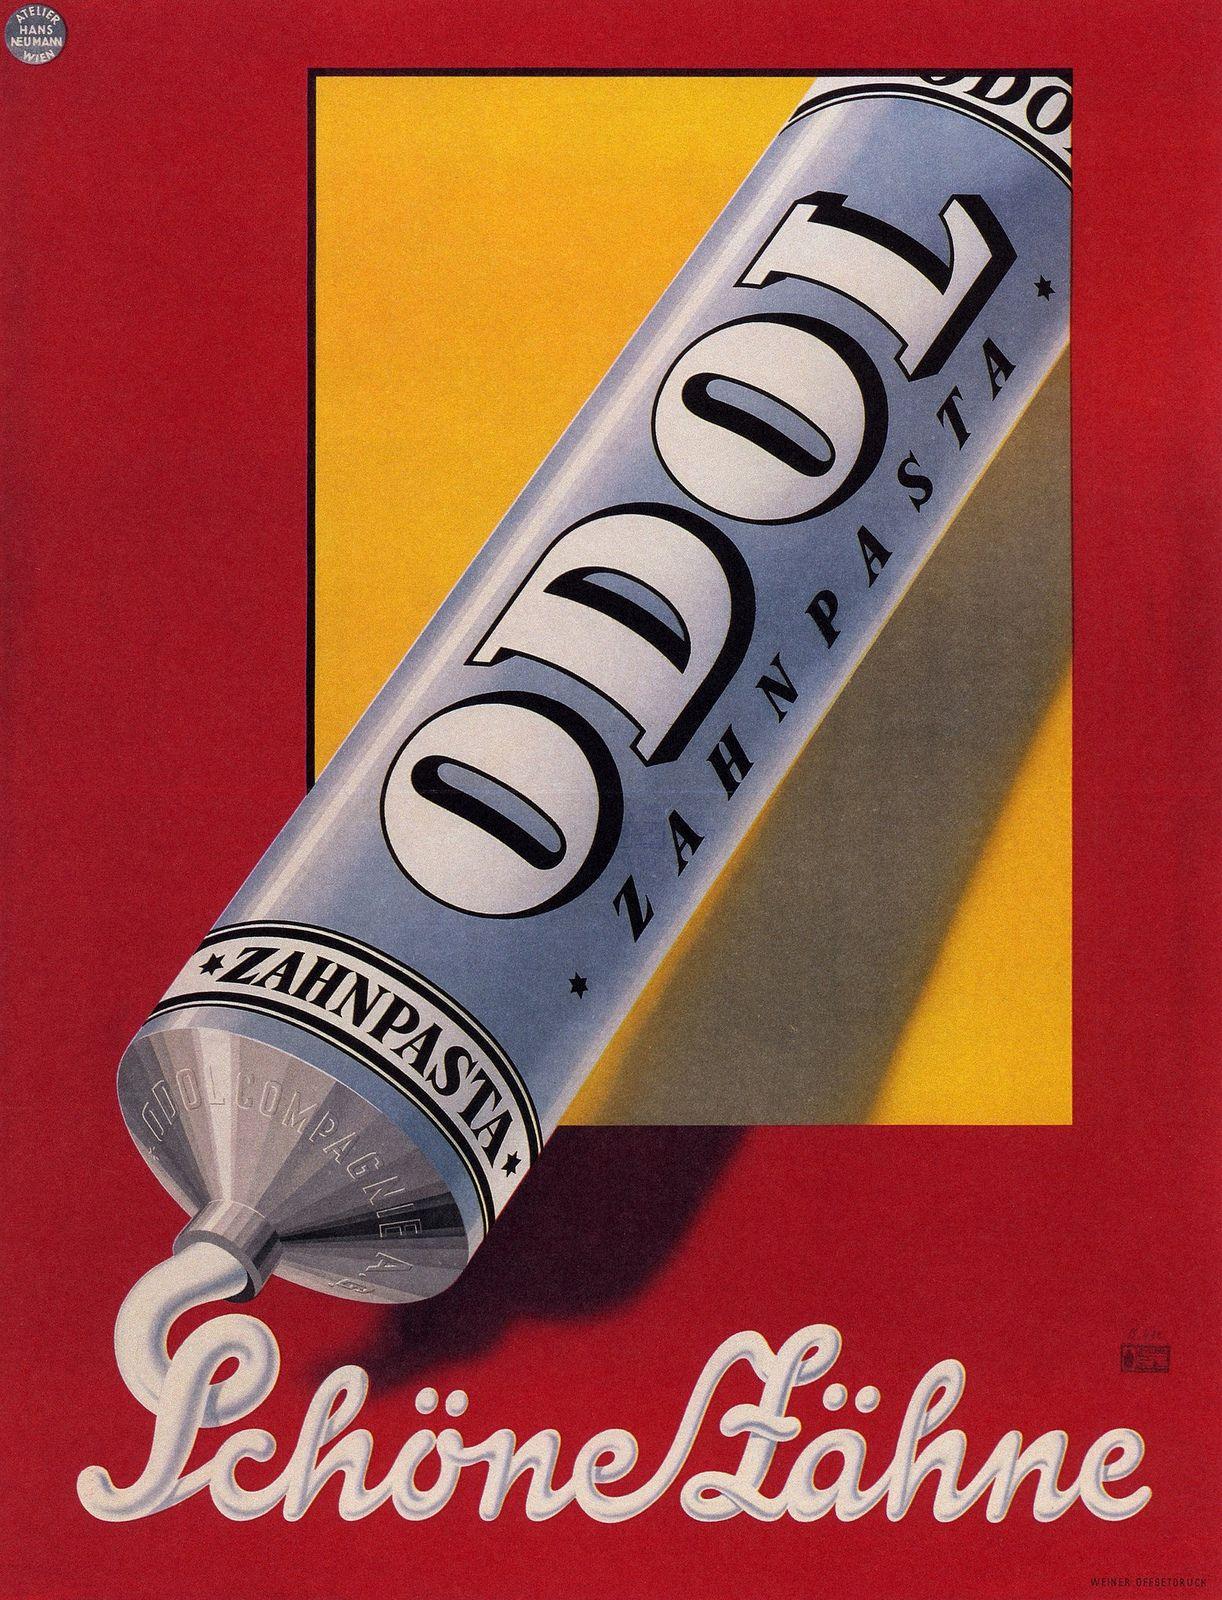 Odol Zahnpasta VINTAGE AD POSTER Austria 1925 24X36 Retro Prized Cool